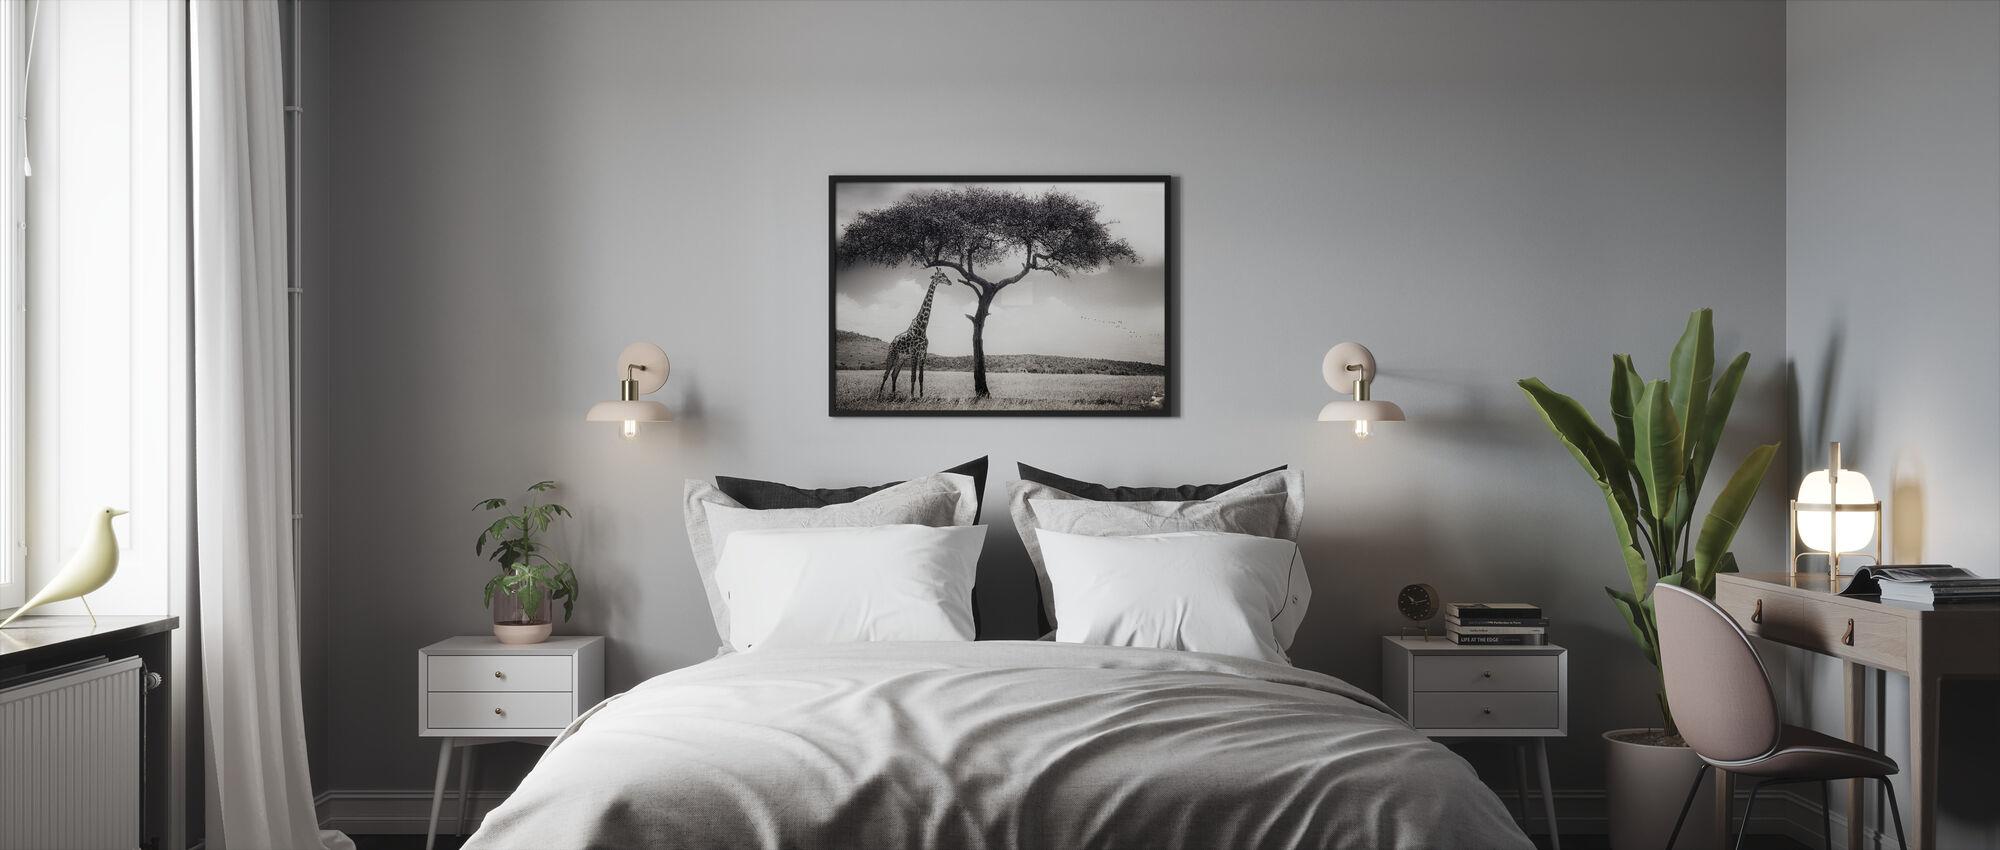 Under the African Sun - Framed print - Bedroom